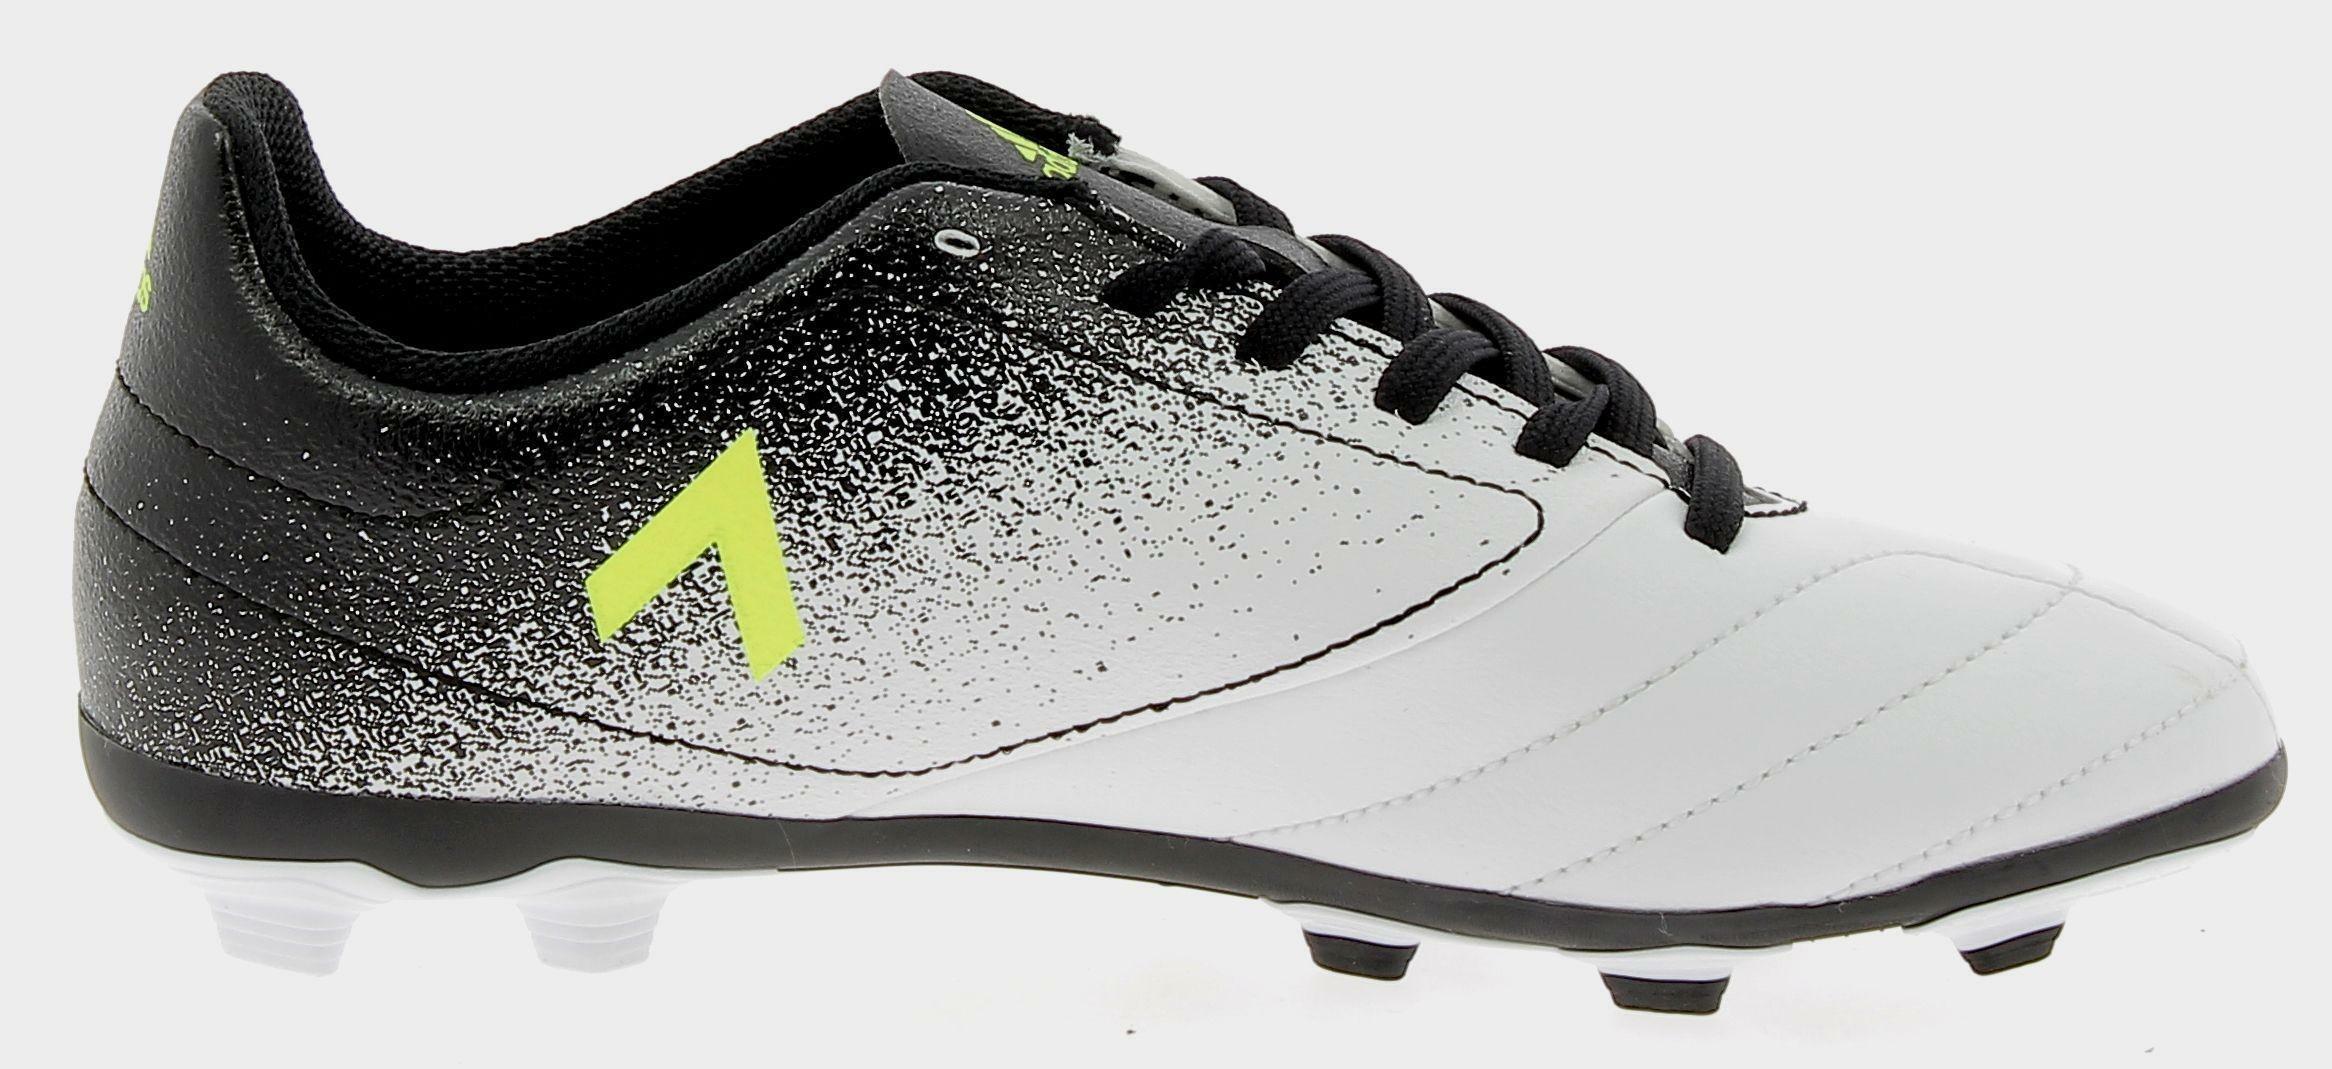 adidas adidas ace 17.4 fxg j scarpe calcio bambino